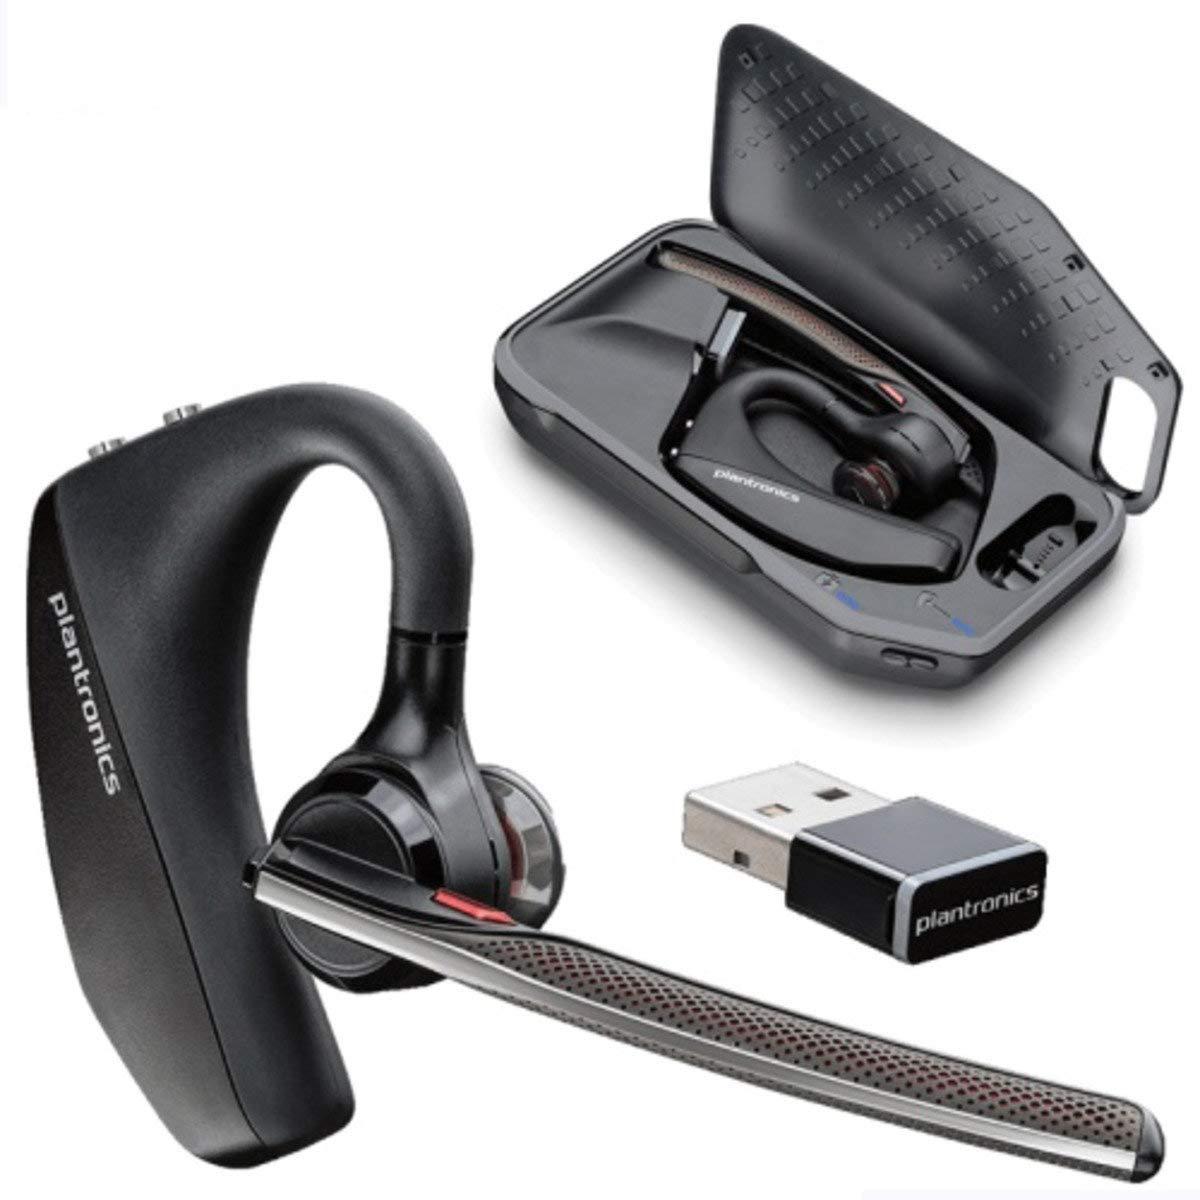 Plantronics VOYAGER 5200 206110 01 Advanced Bluetooth